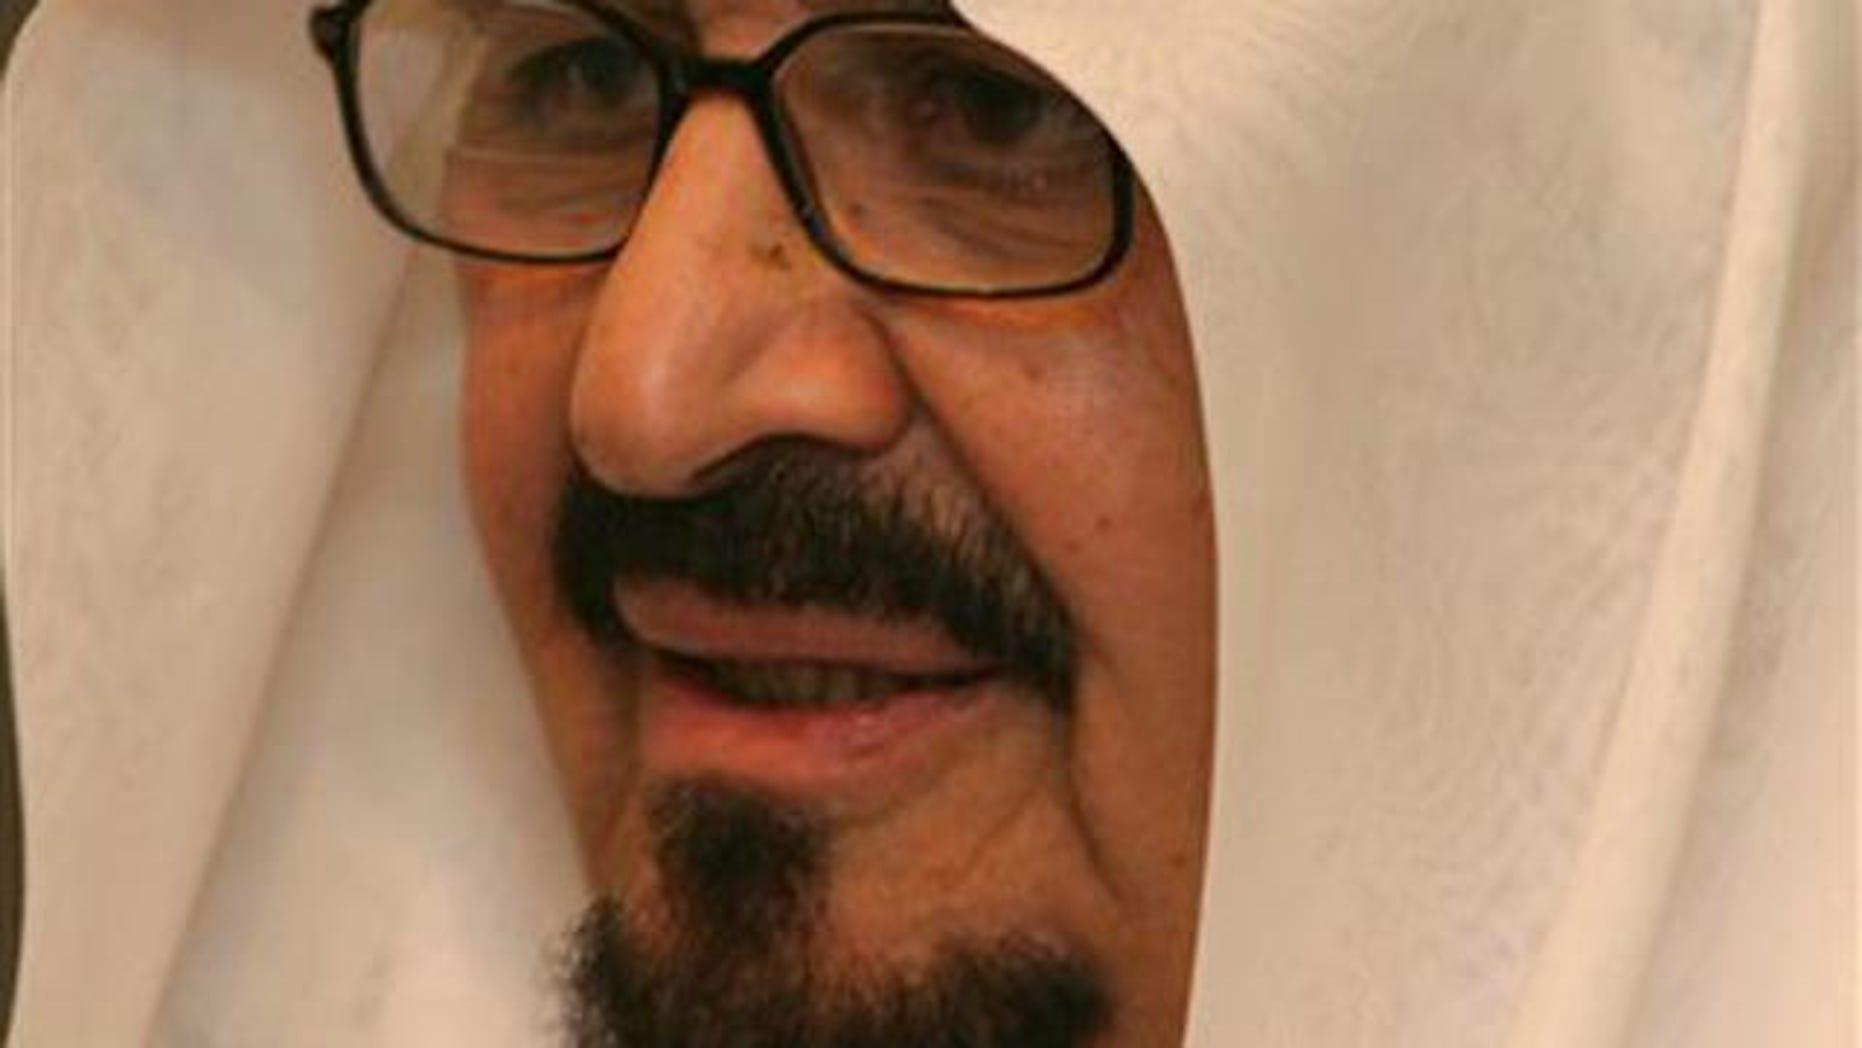 FILE - Saudi Crown prince Sultan Bin Abdel Aziz attends the signing of the final border demarcation agreement between Yemen and Saudi Arabia in the southern Yemeni port city of al-Mukalla.